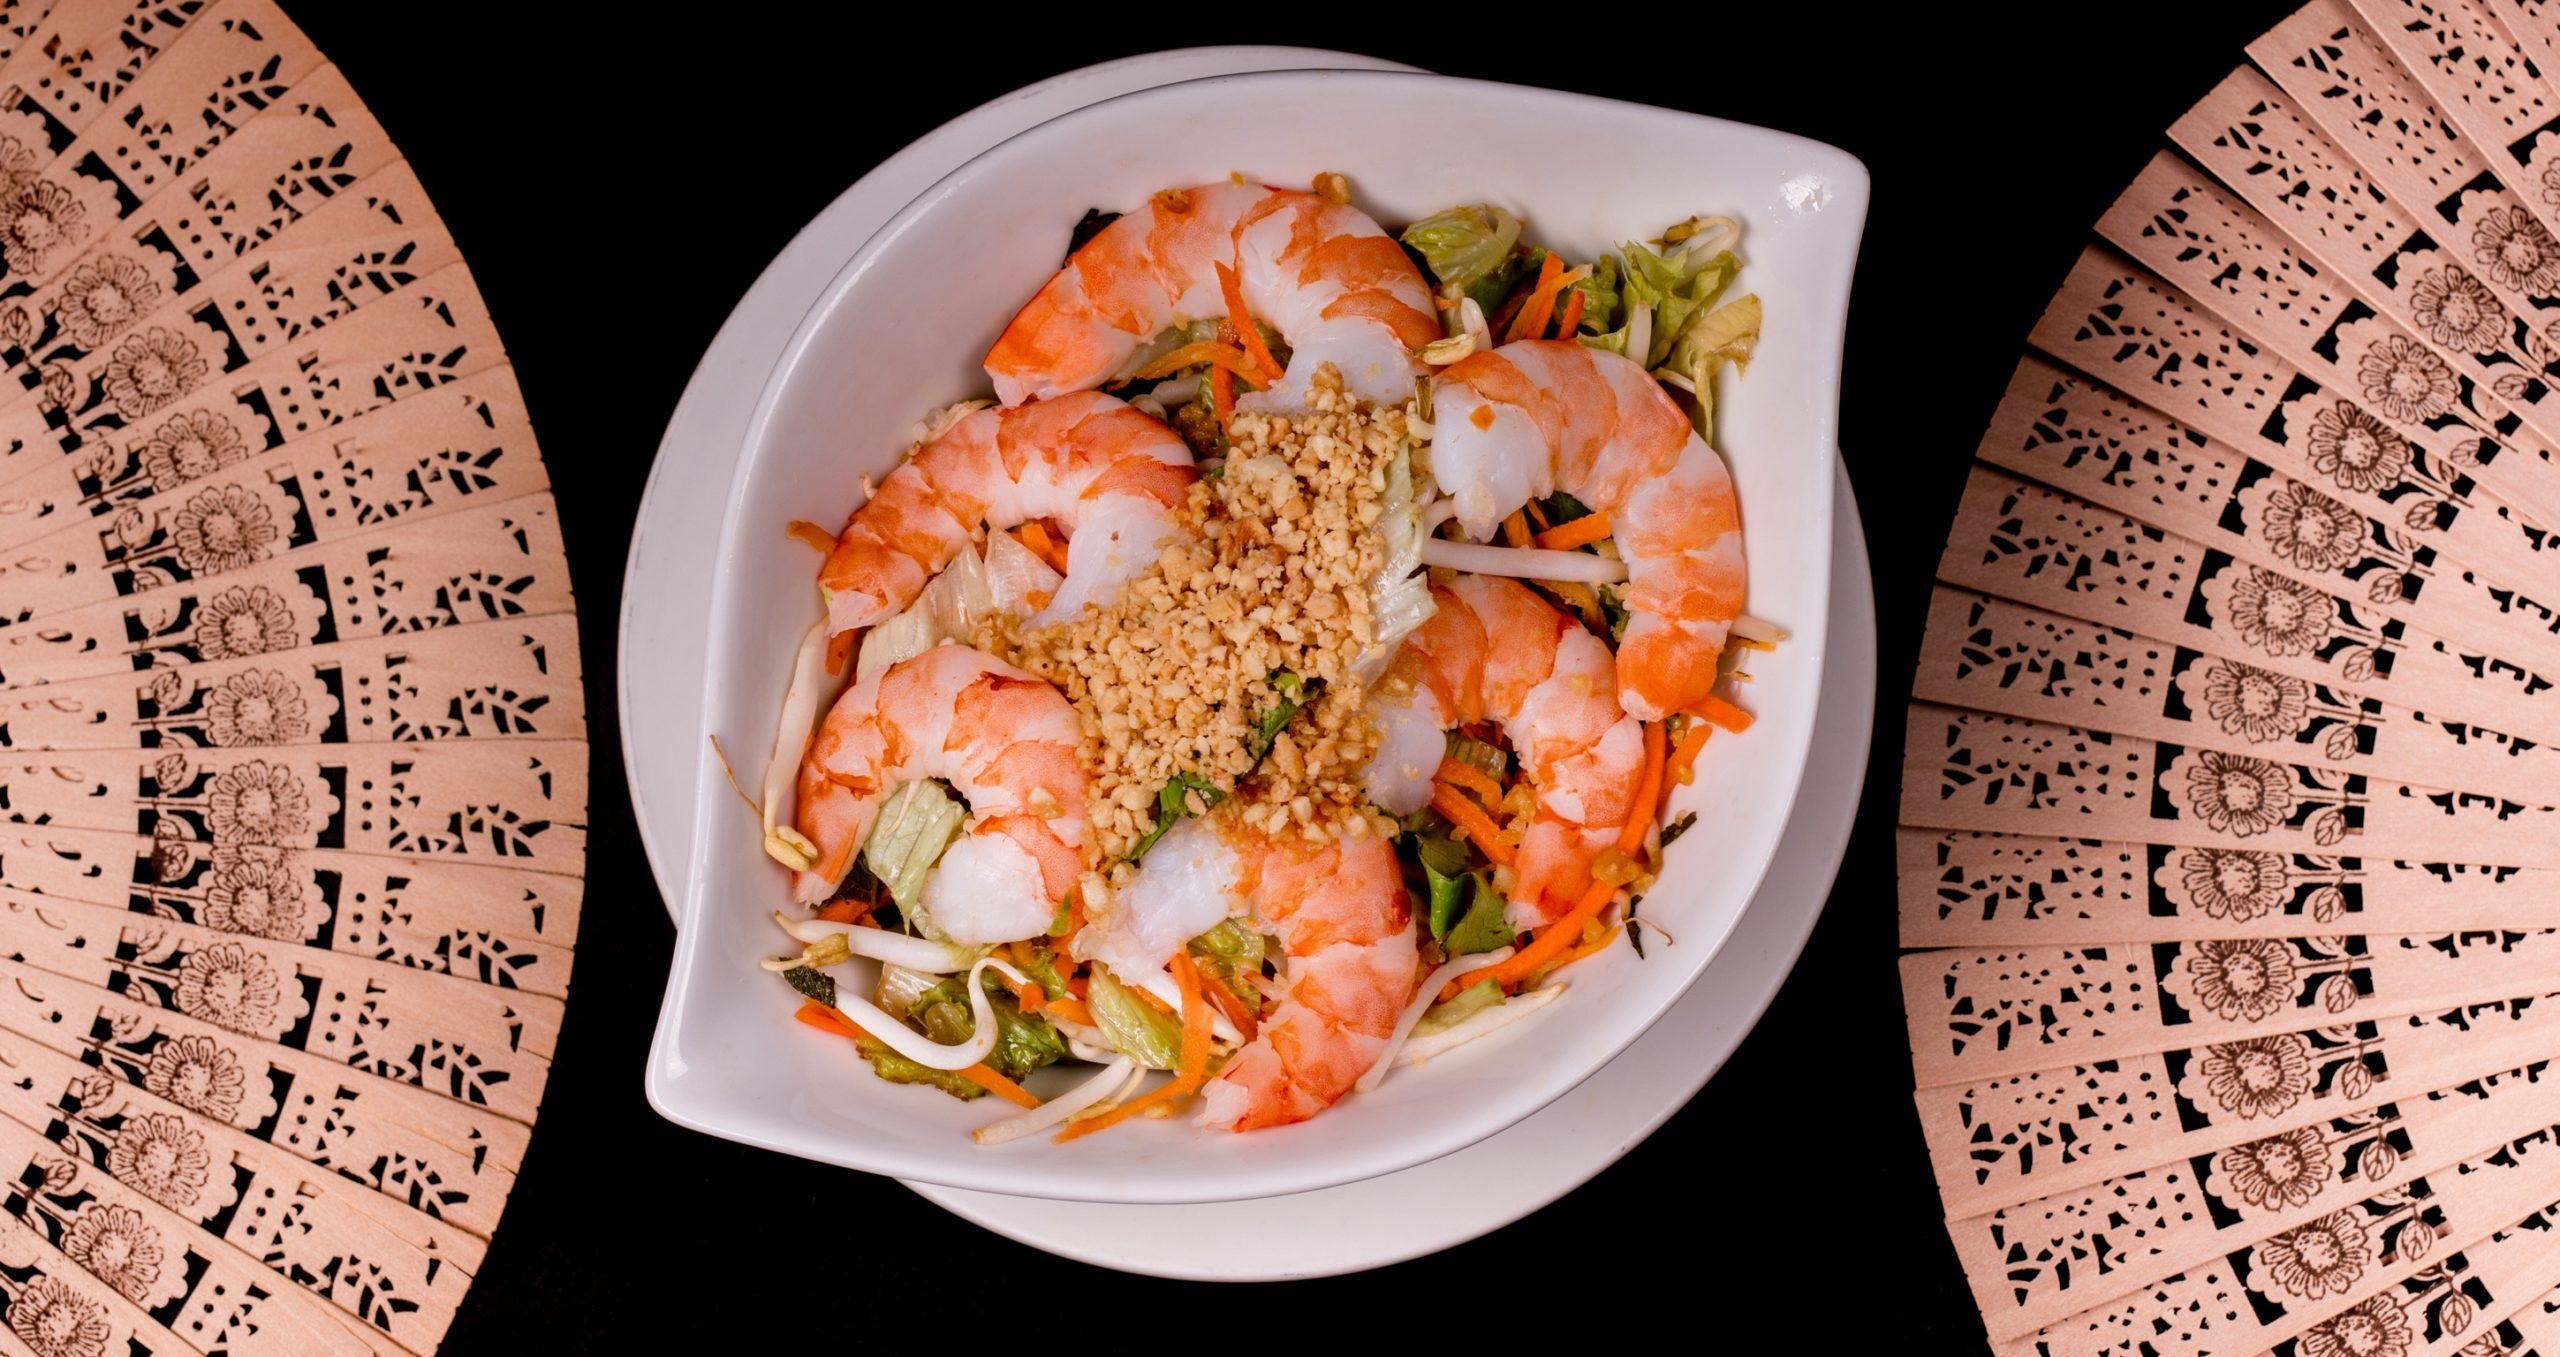 蝦片沙拉 | Salade de crevettes